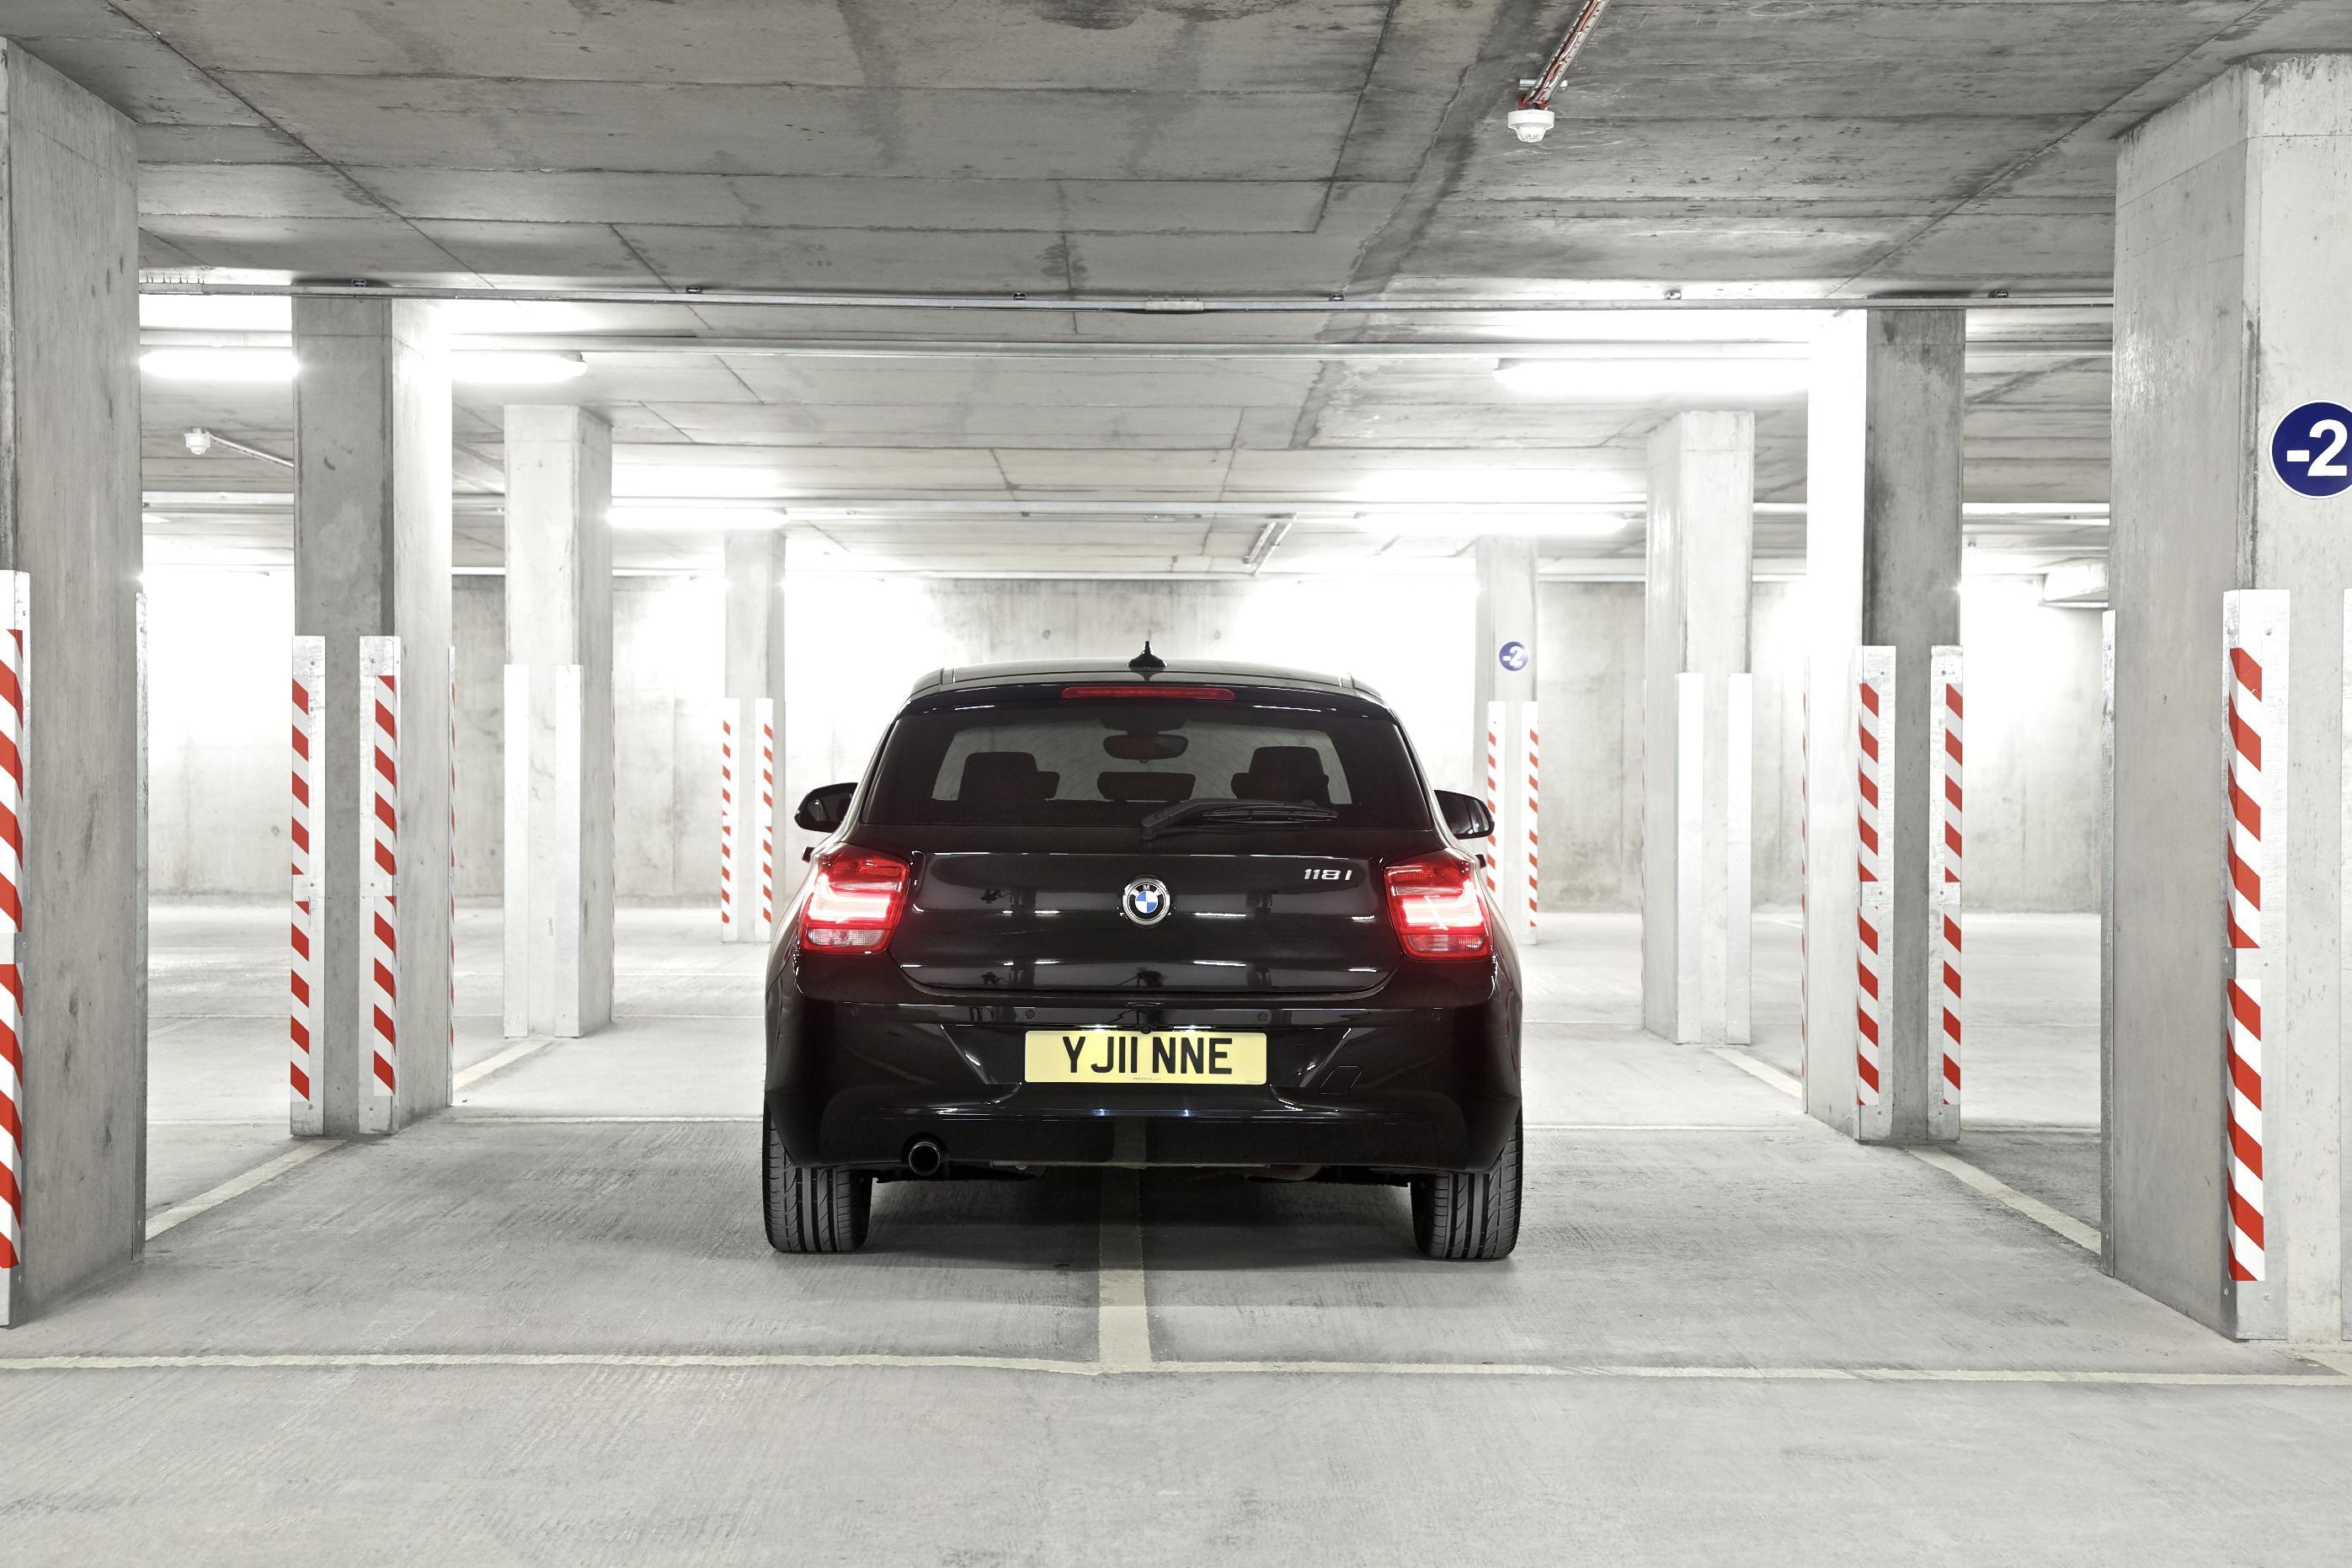 BMW 1 Series (2011) 5